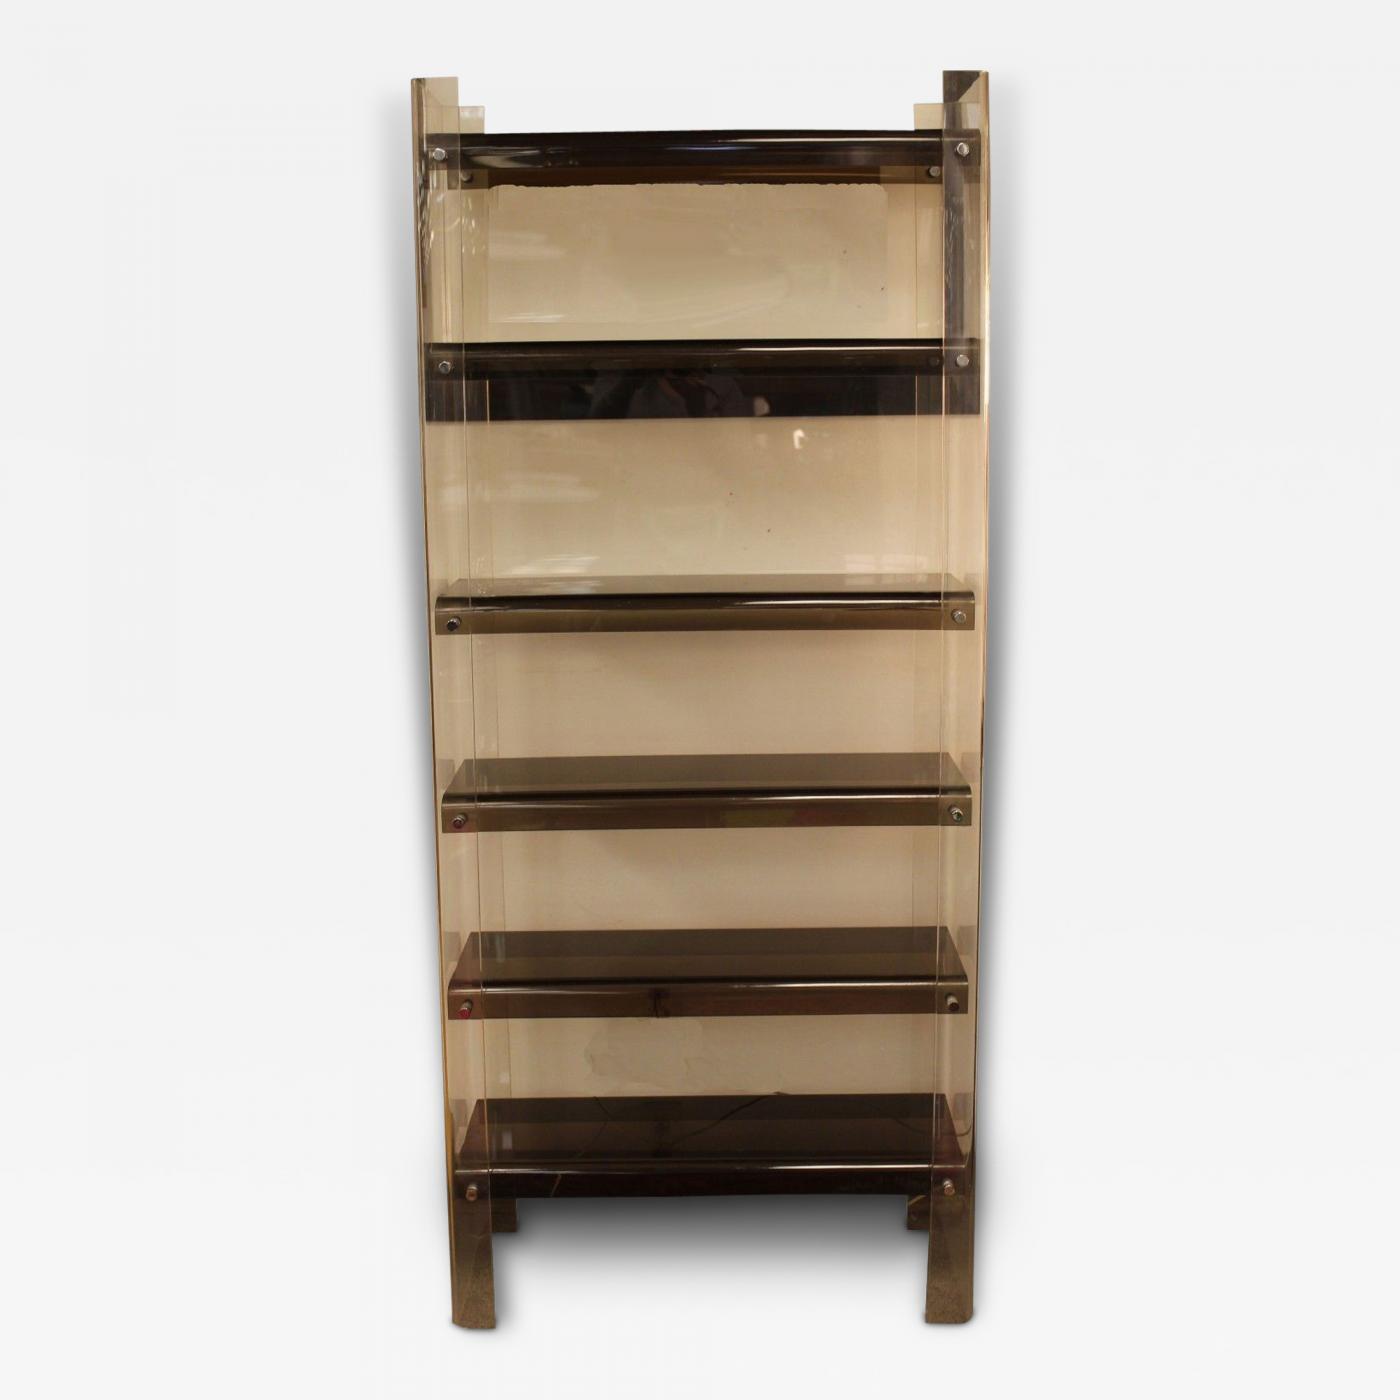 Milo baughman mid century modern milo baughman acrylic - Modern bookshelf wall unit ...